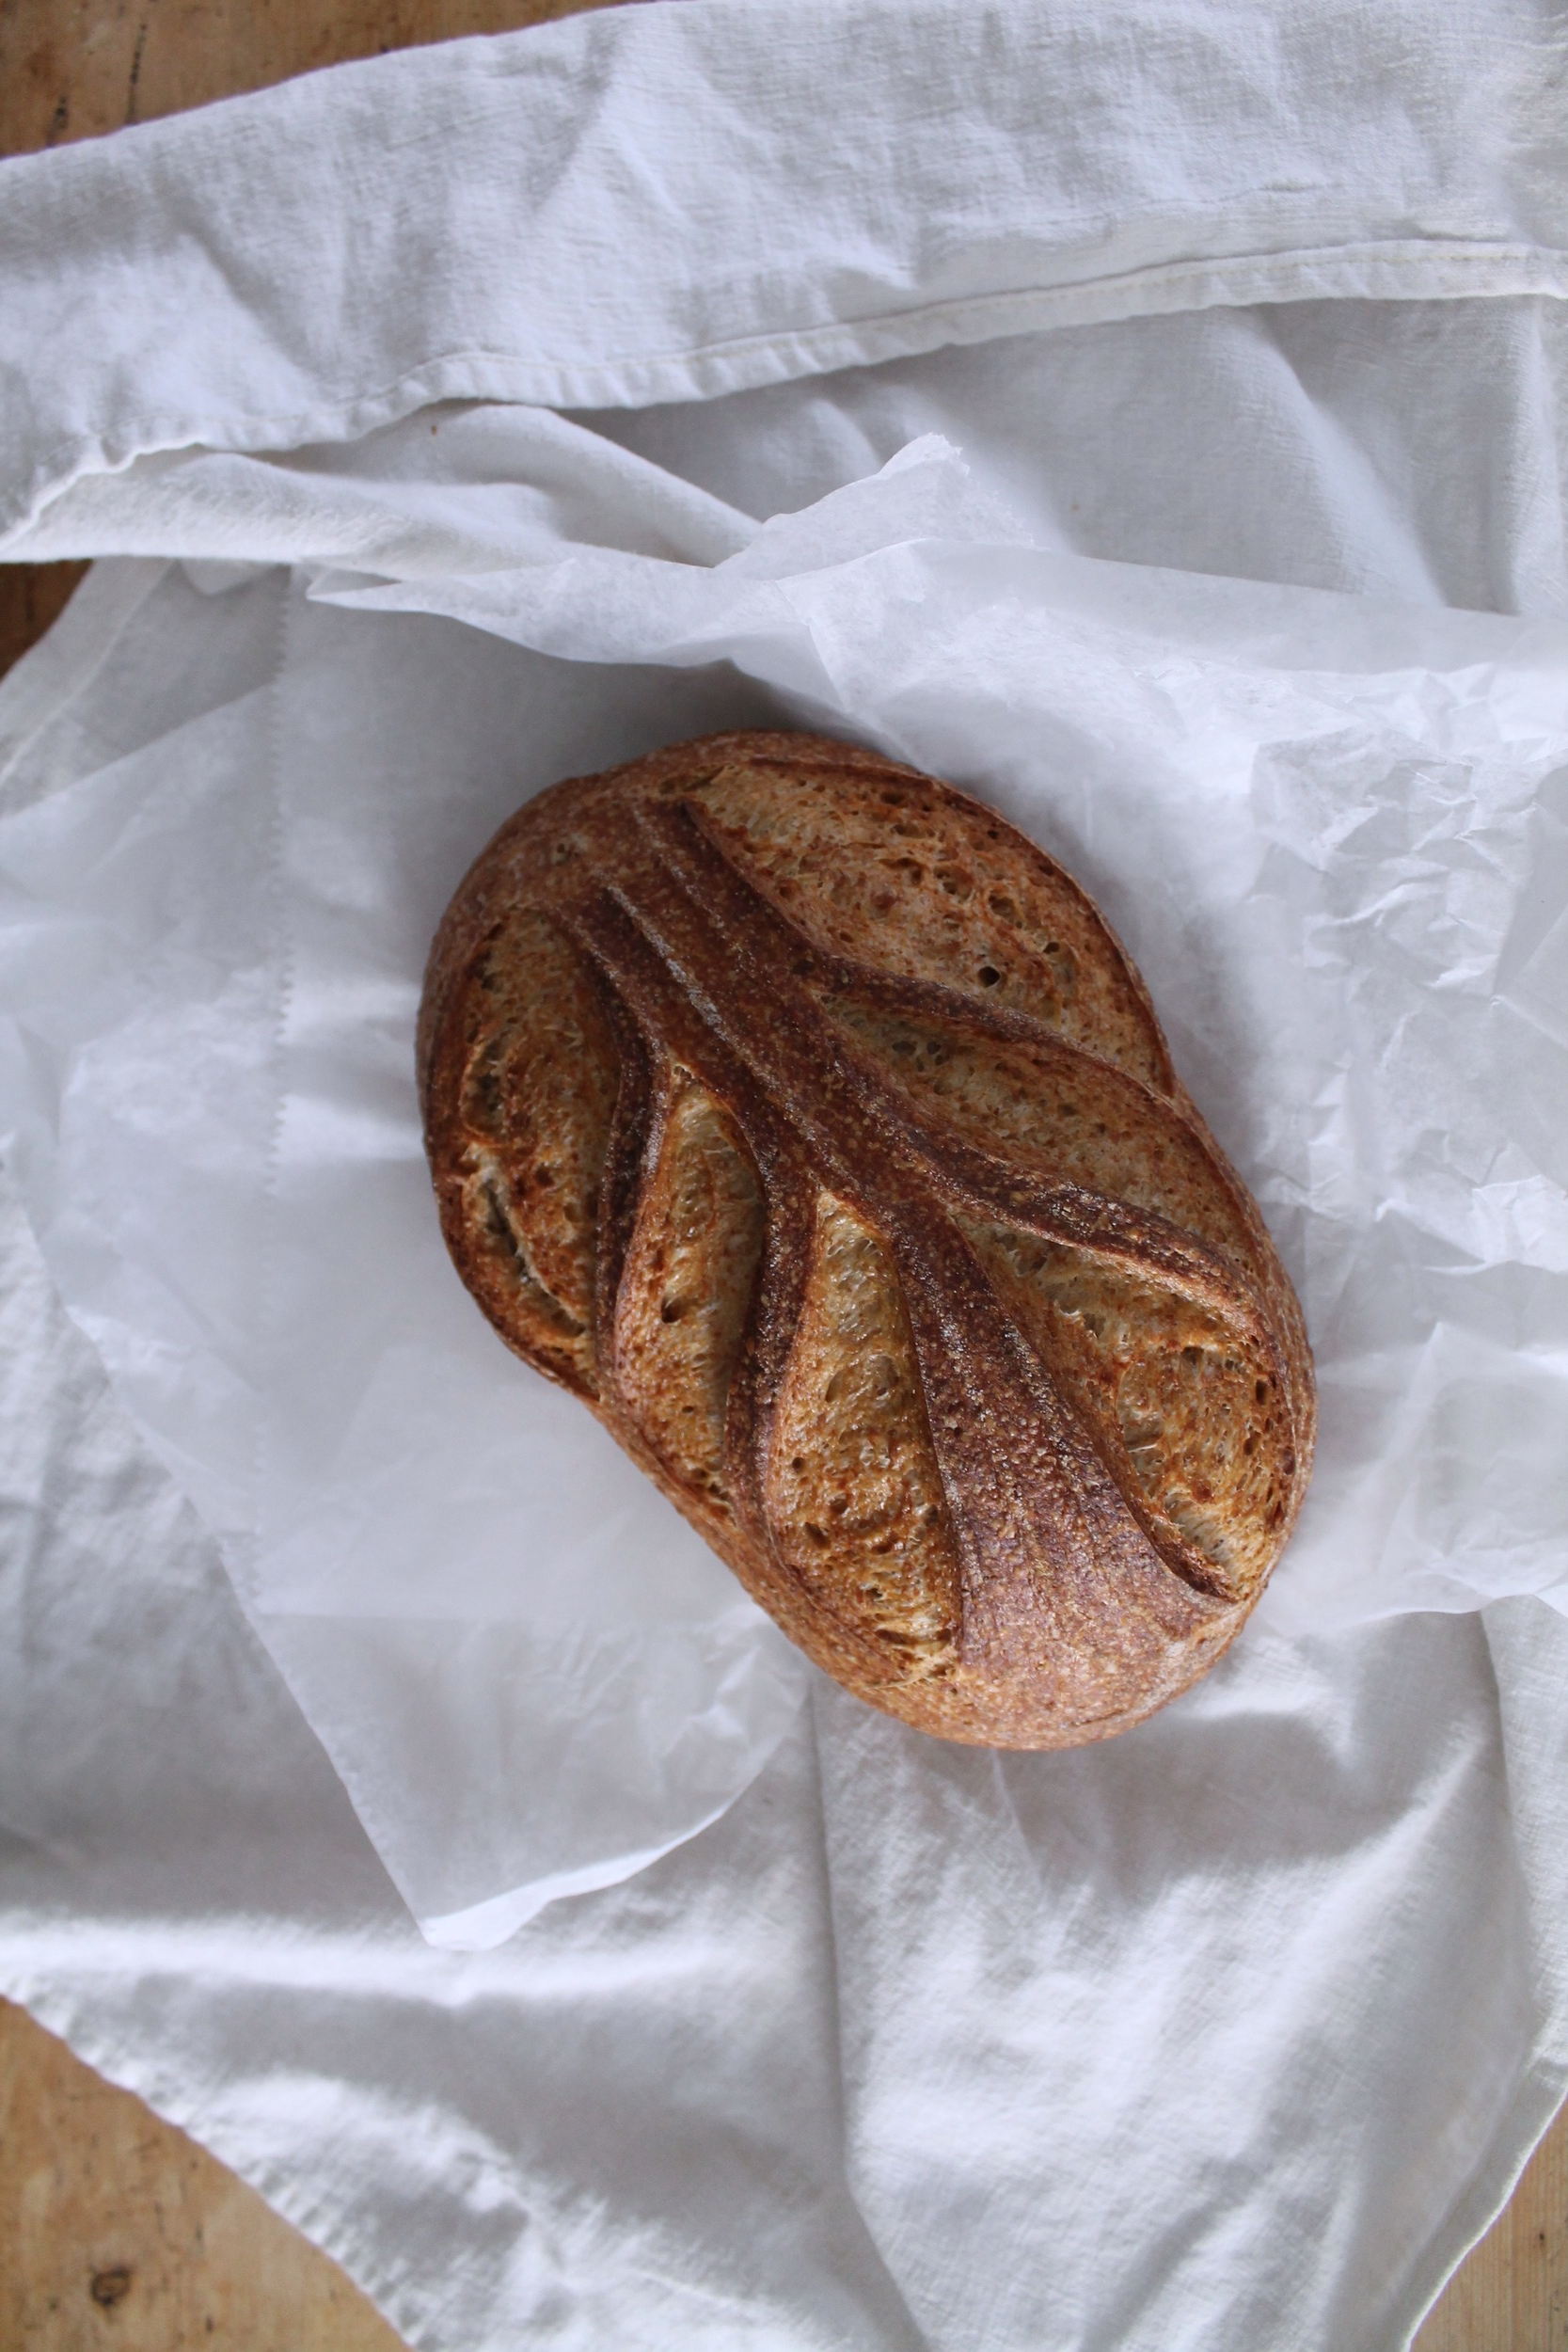 Bread | www.hungryinlove.com